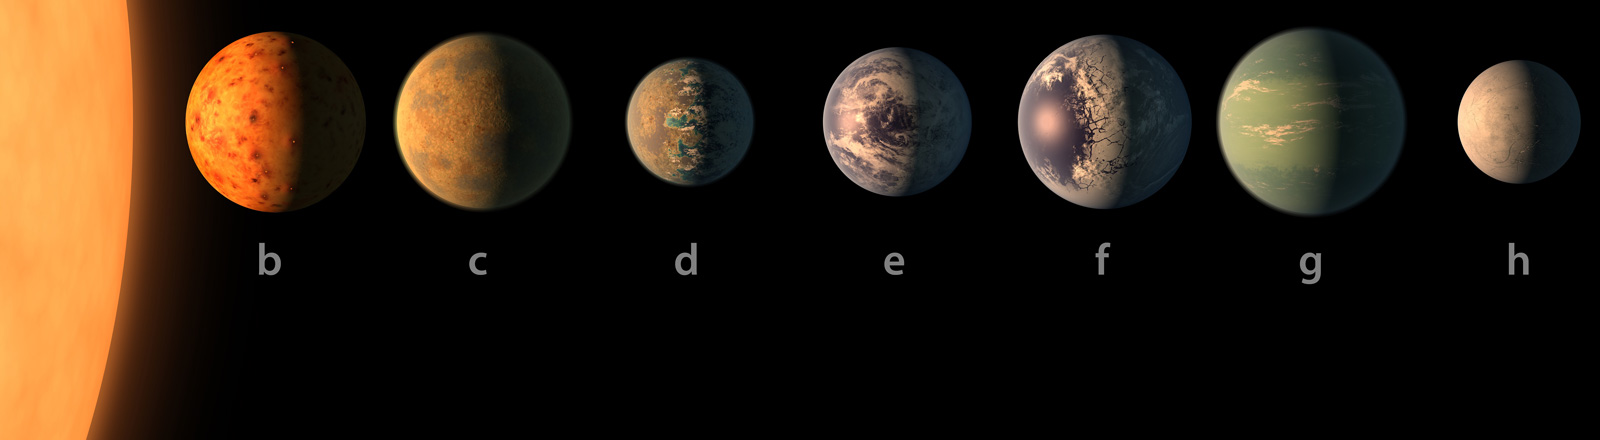 Illustration des Planetensystems